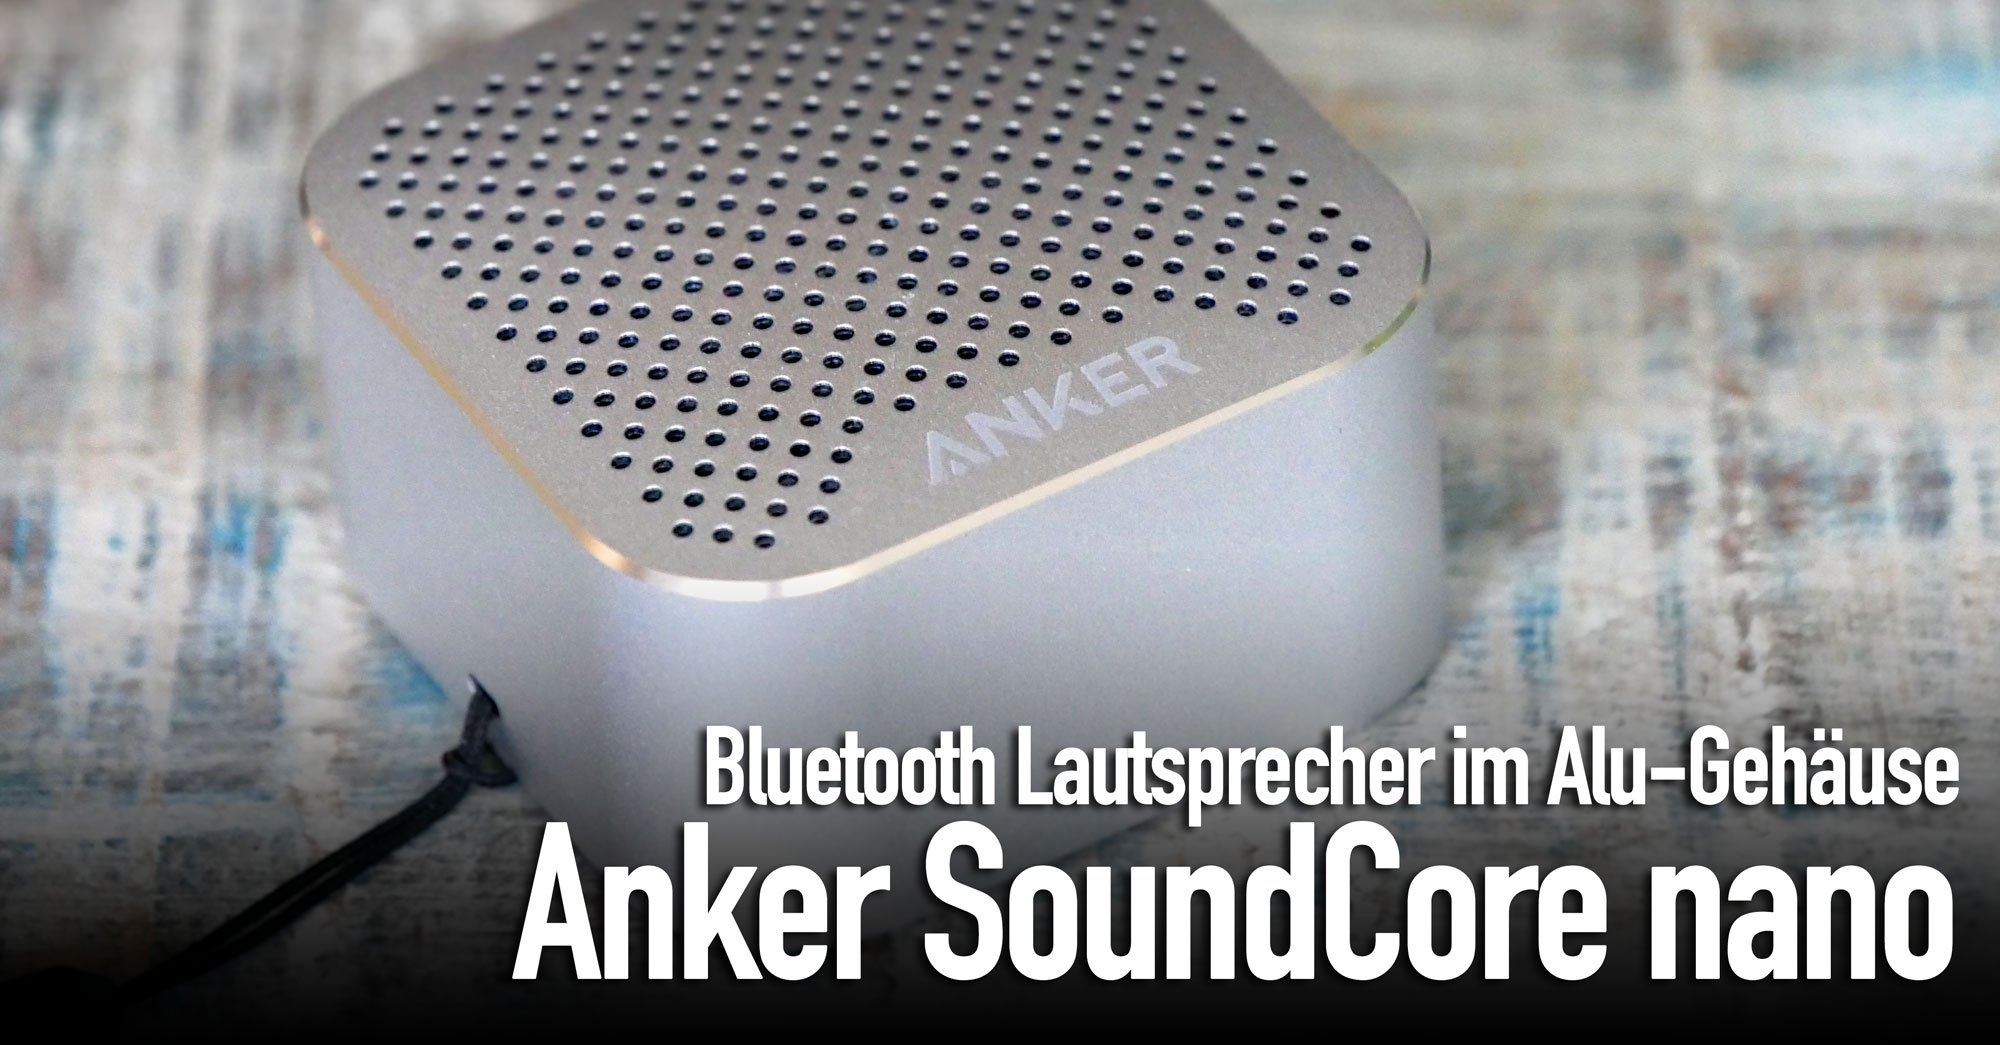 Anker SoundCore nano: kleiner, starker Aluminium Bluetooth Lautsprecher 9